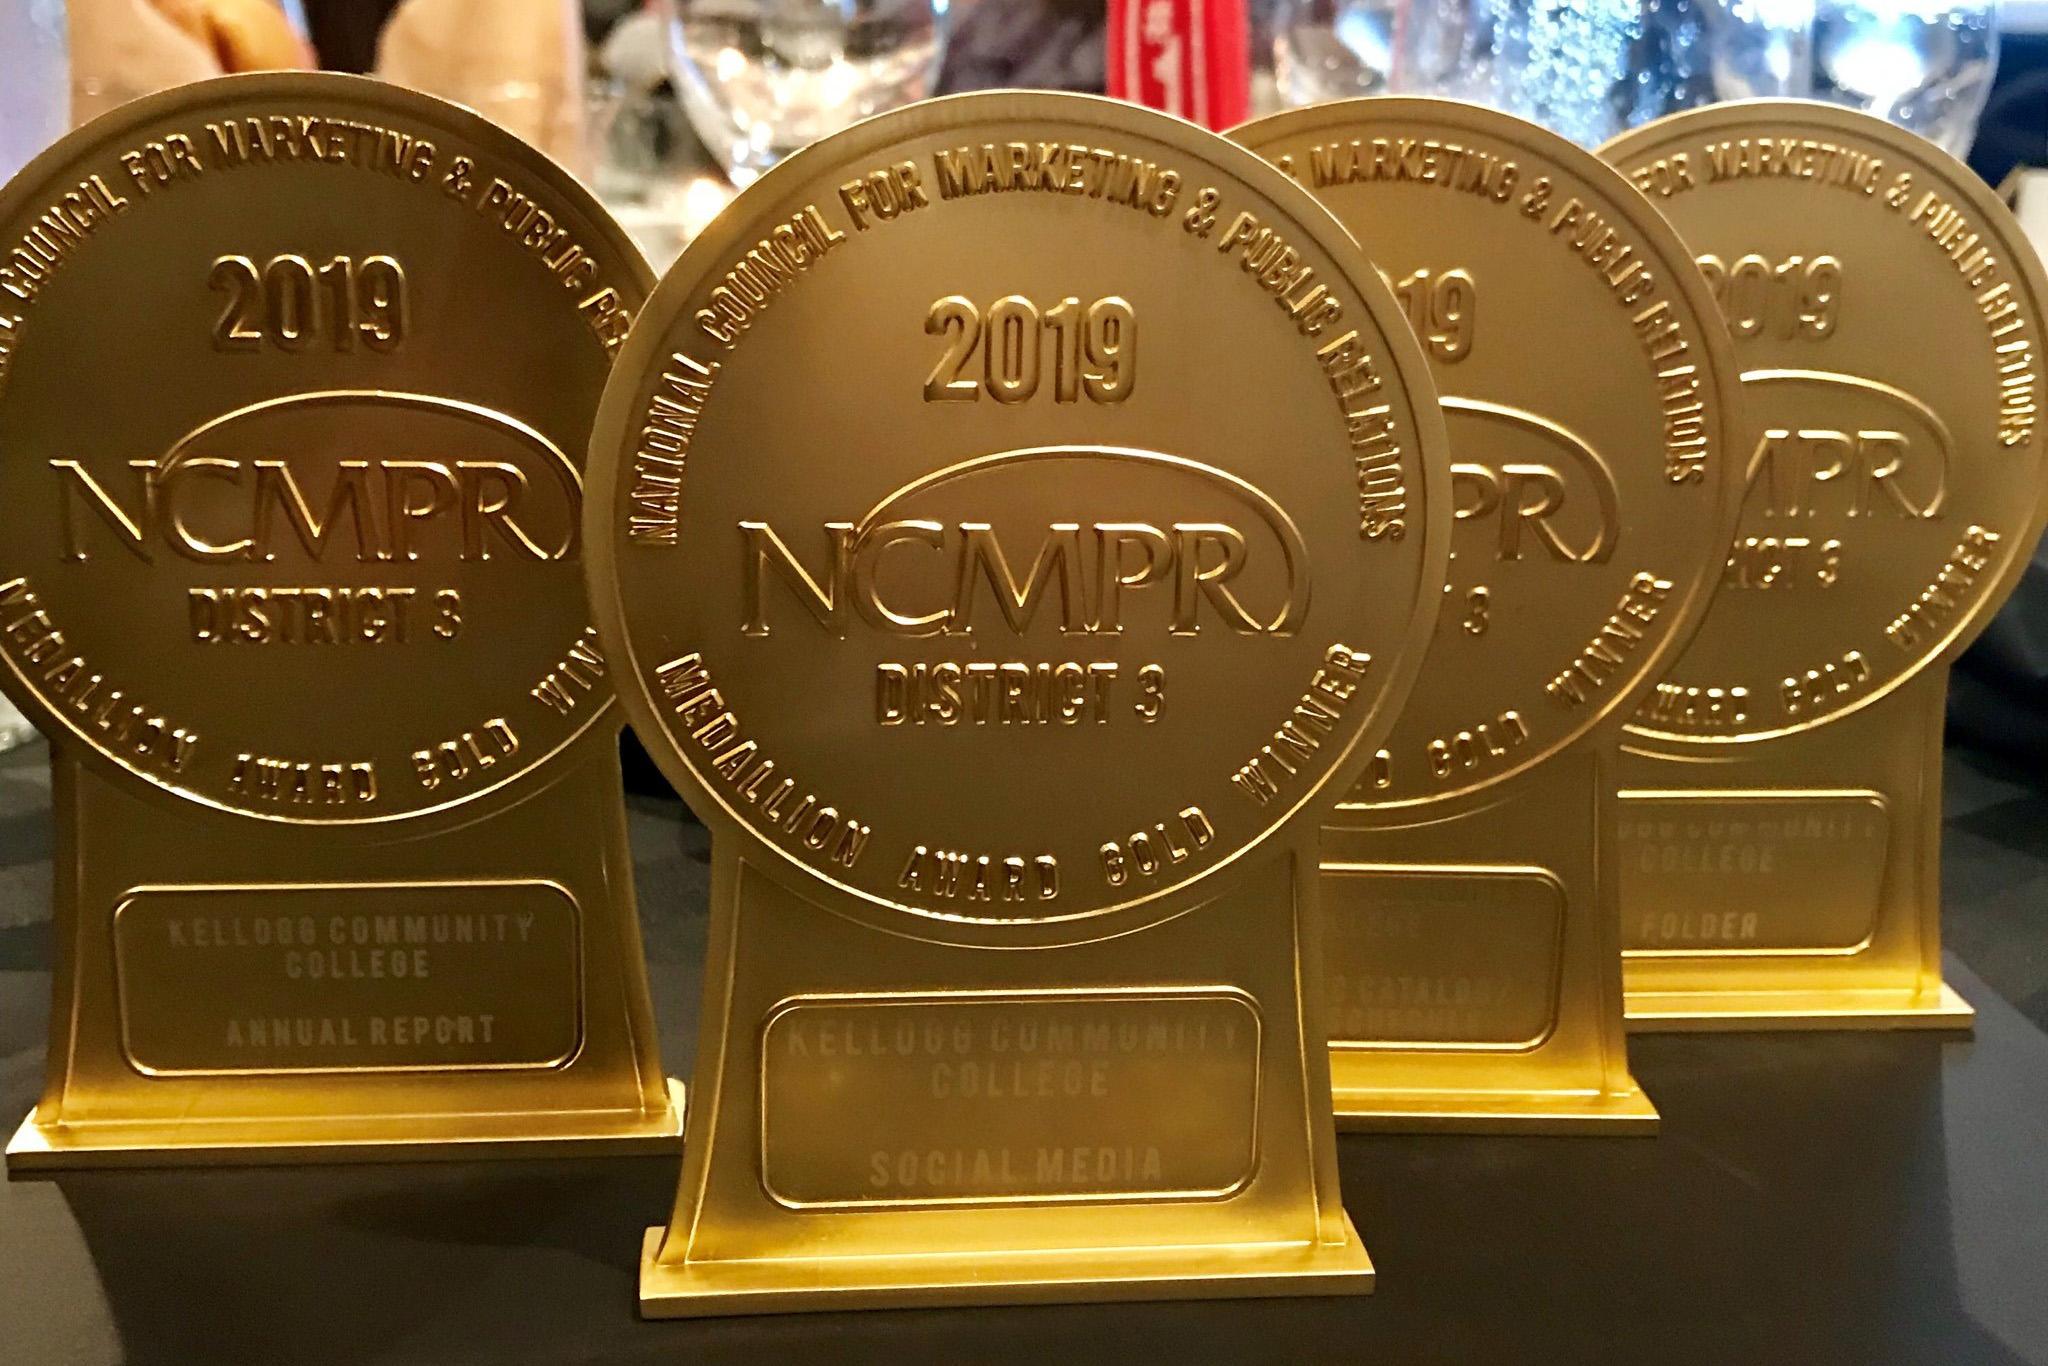 Kcc S Public Information And Marketing Team Wins Regional Awards Kcc Daily